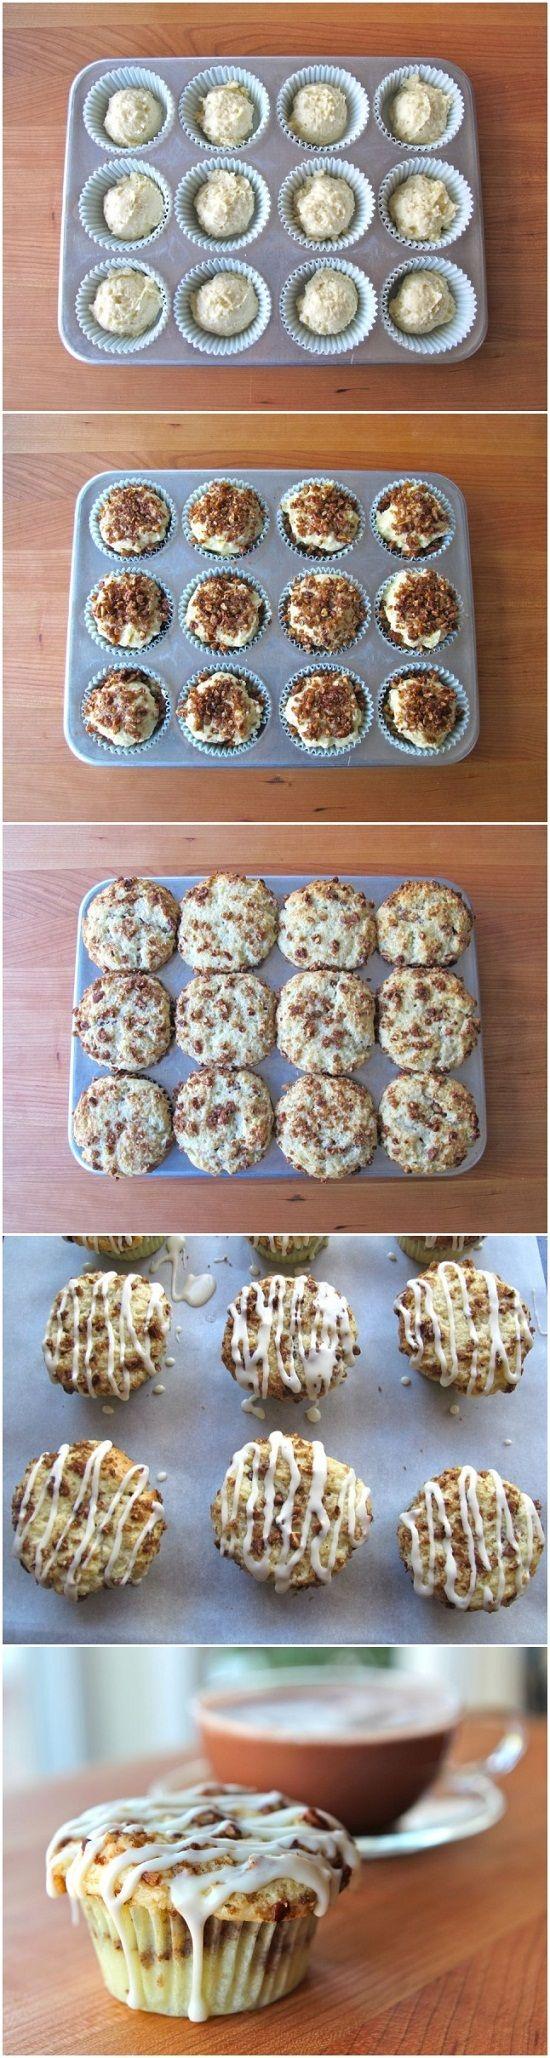 Coffee Cake Cupcakes   Cakes   Pinterest   Coffee Cake, Coffee and ...